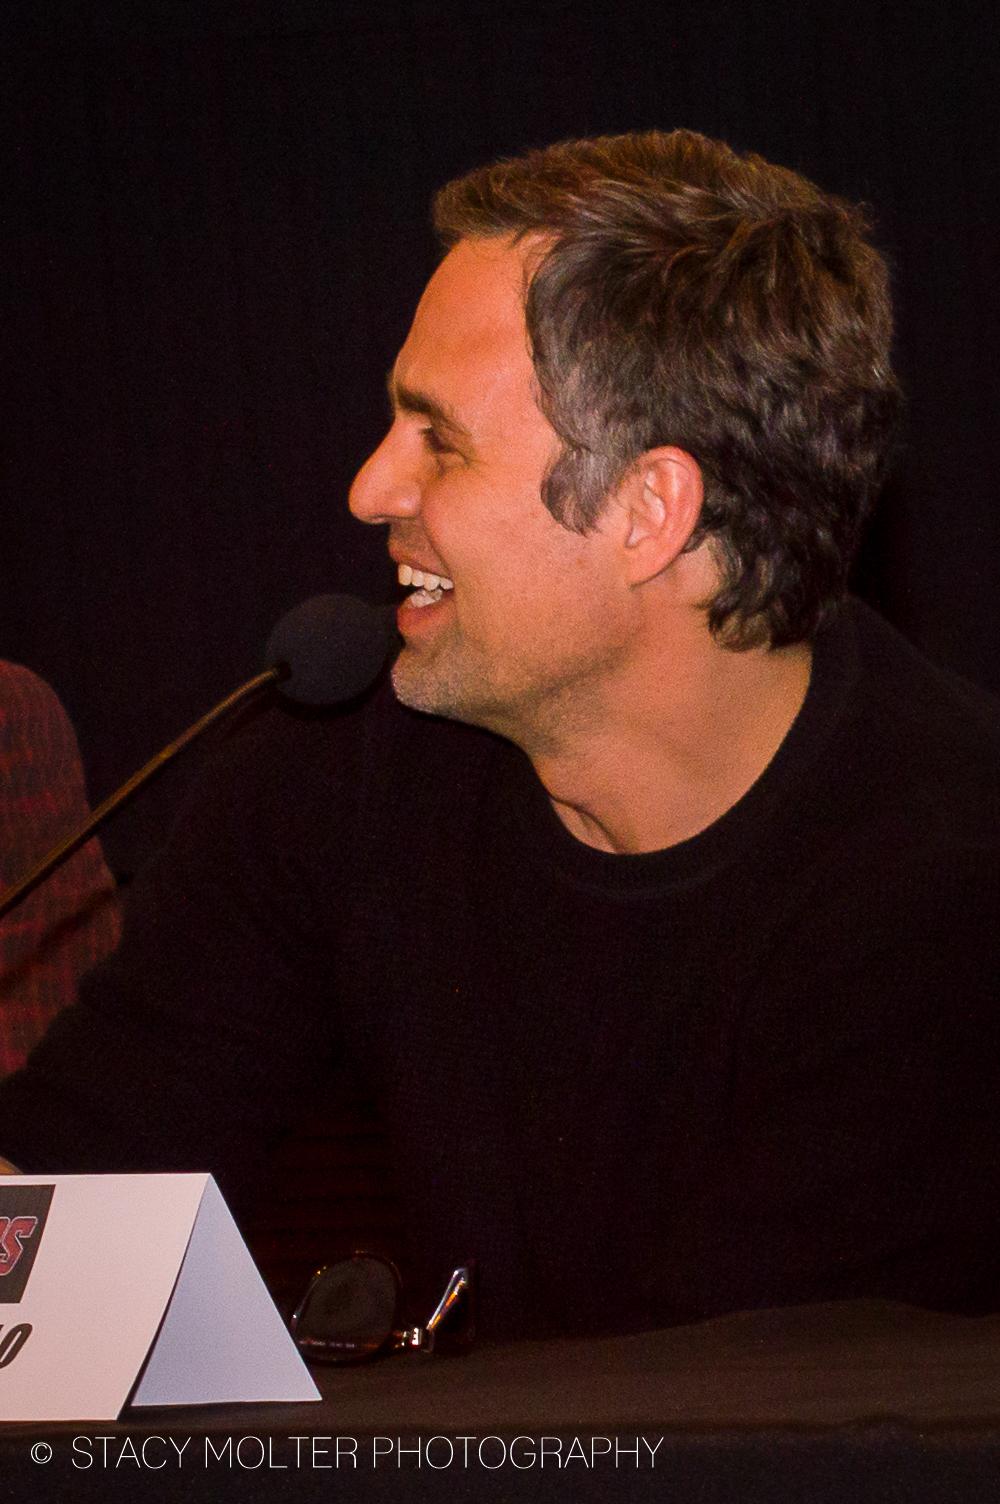 Mark Ruffalo - Avengers Age of Ultron Press Conference Junket